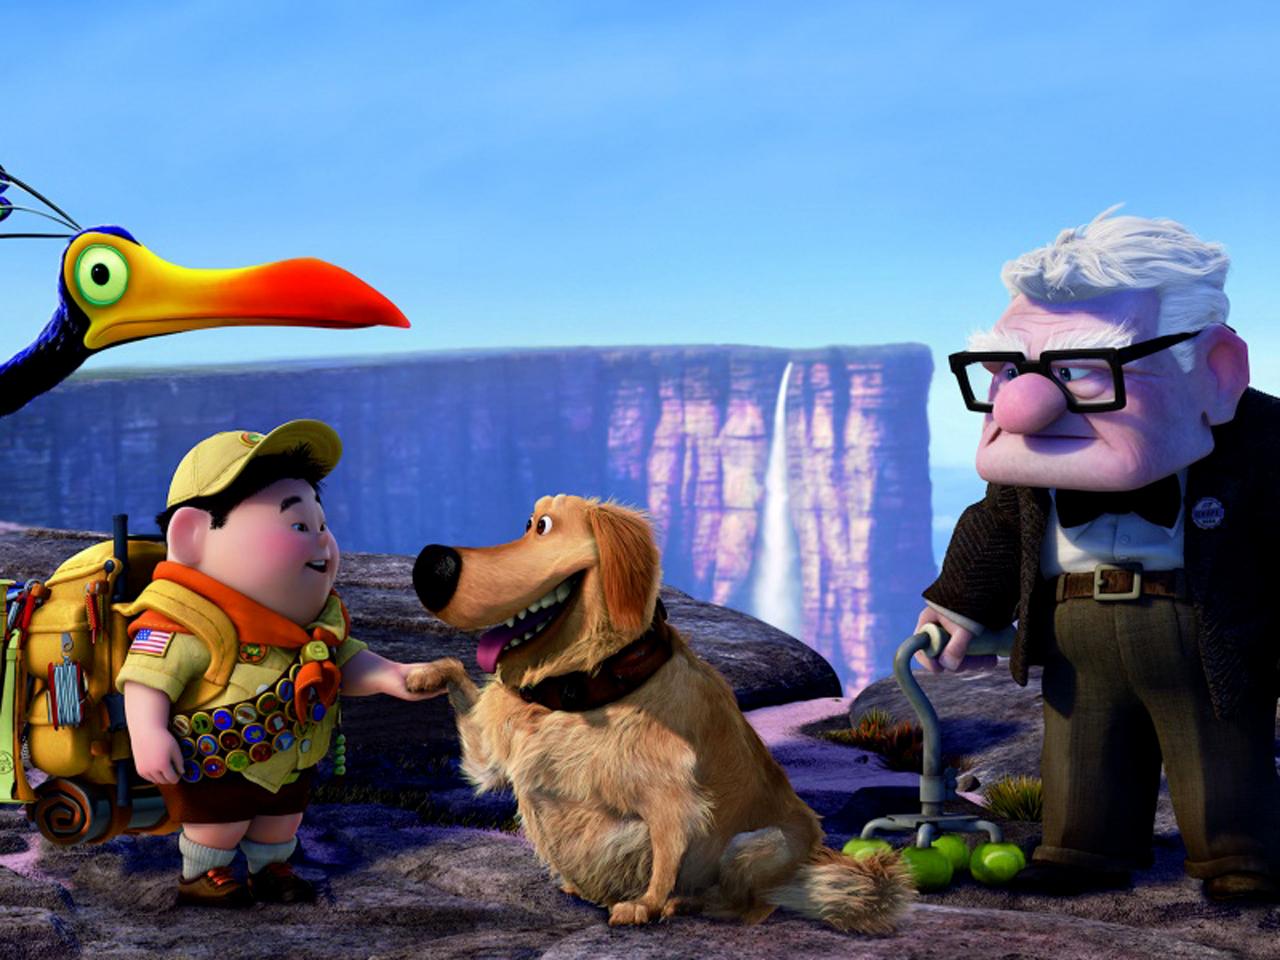 UP 3D Movie Pixar Studios HD Wallpapers Cartoon Wallpapers 1280x960